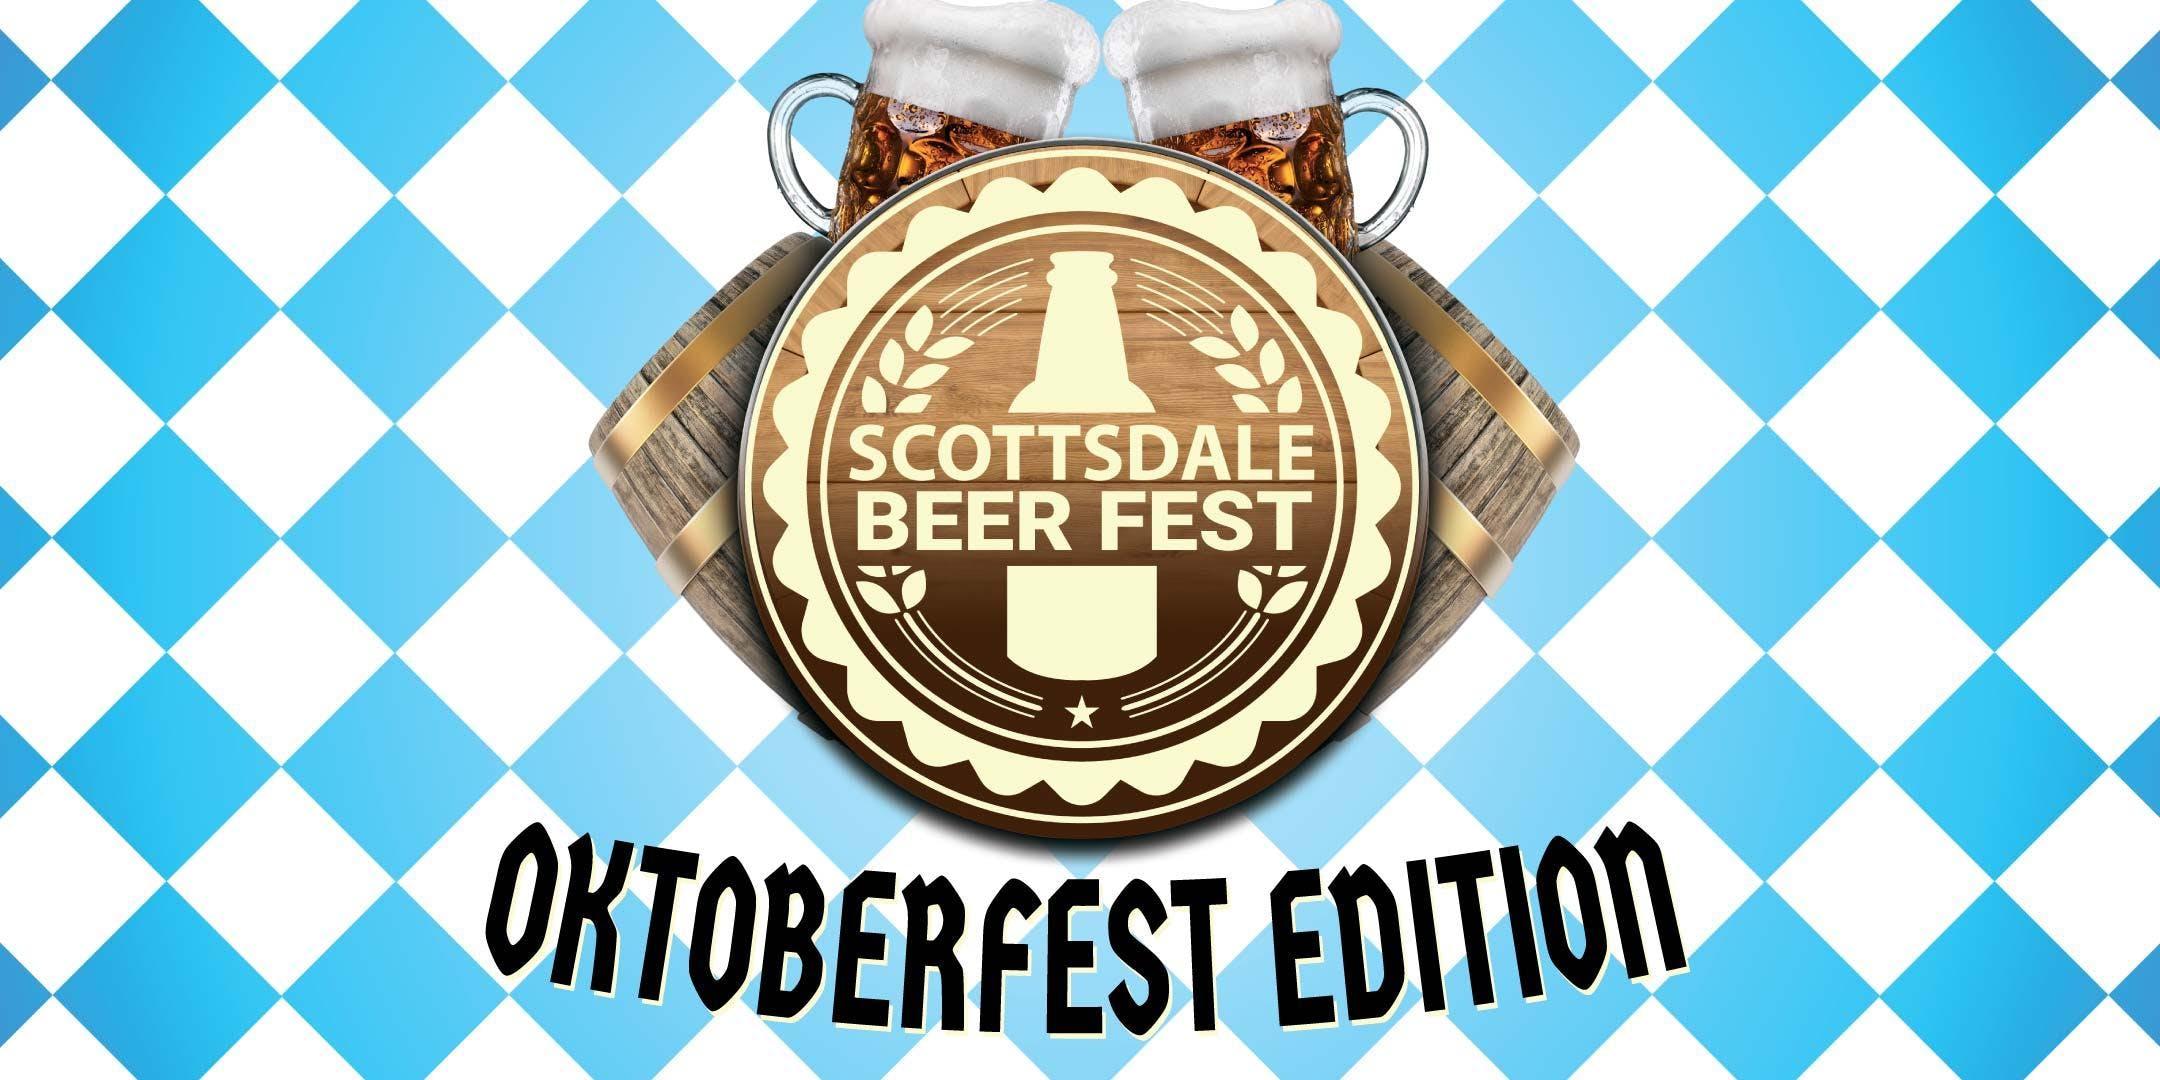 Scottsdale Beer Fest - Oktoberfest Edition - A Beer Tasting in Old Town!